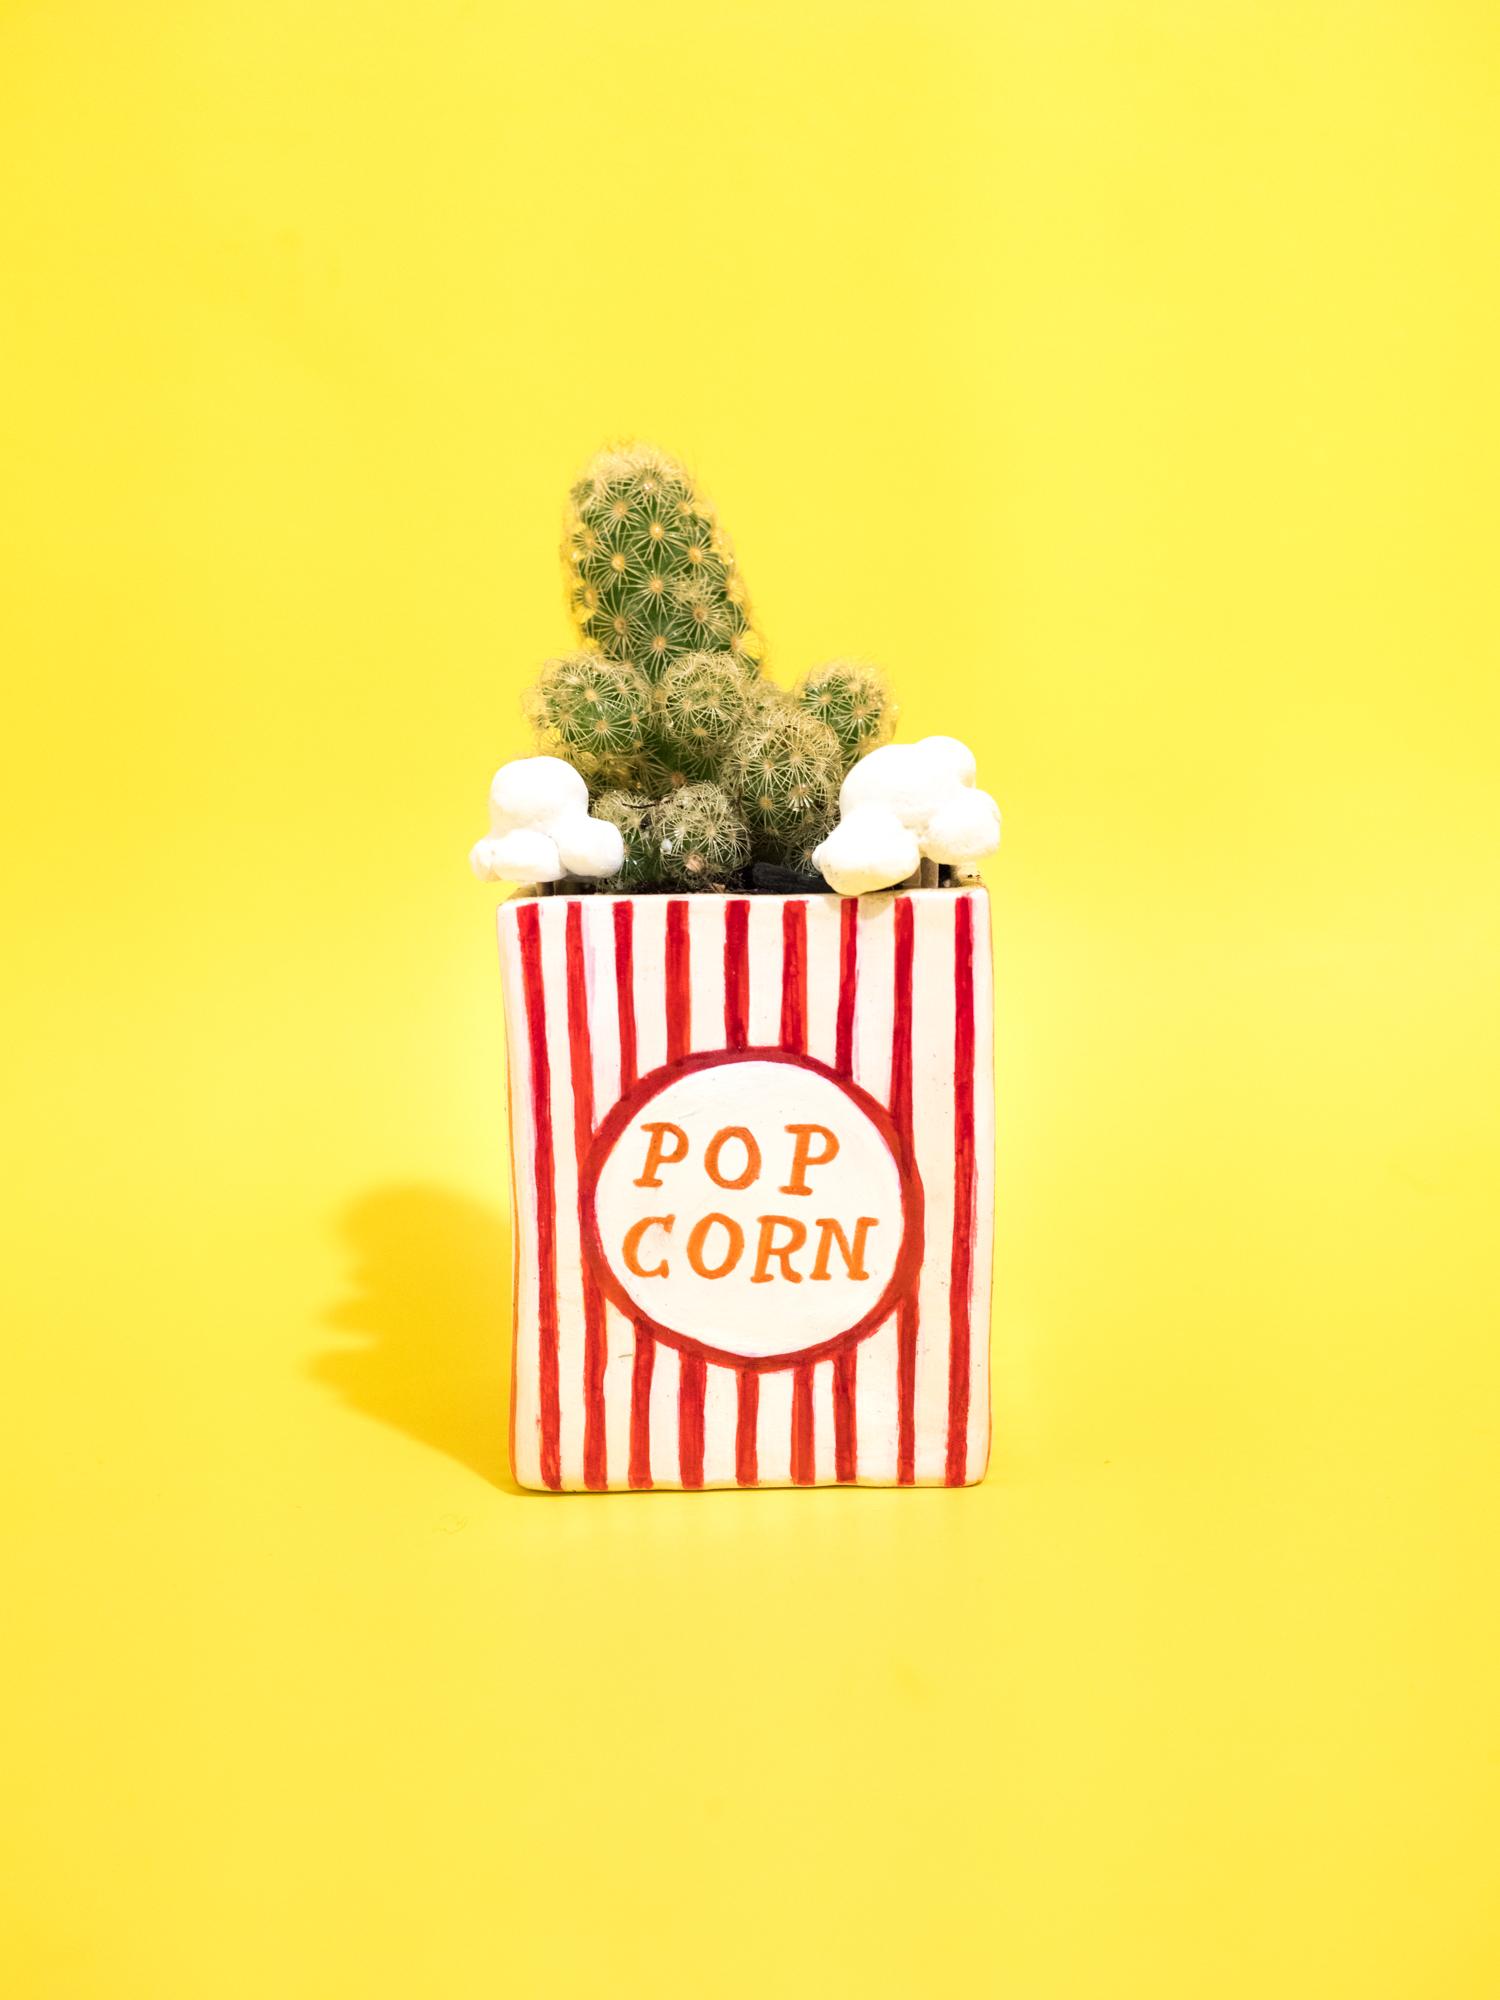 Popcorn-Succulent.jpg